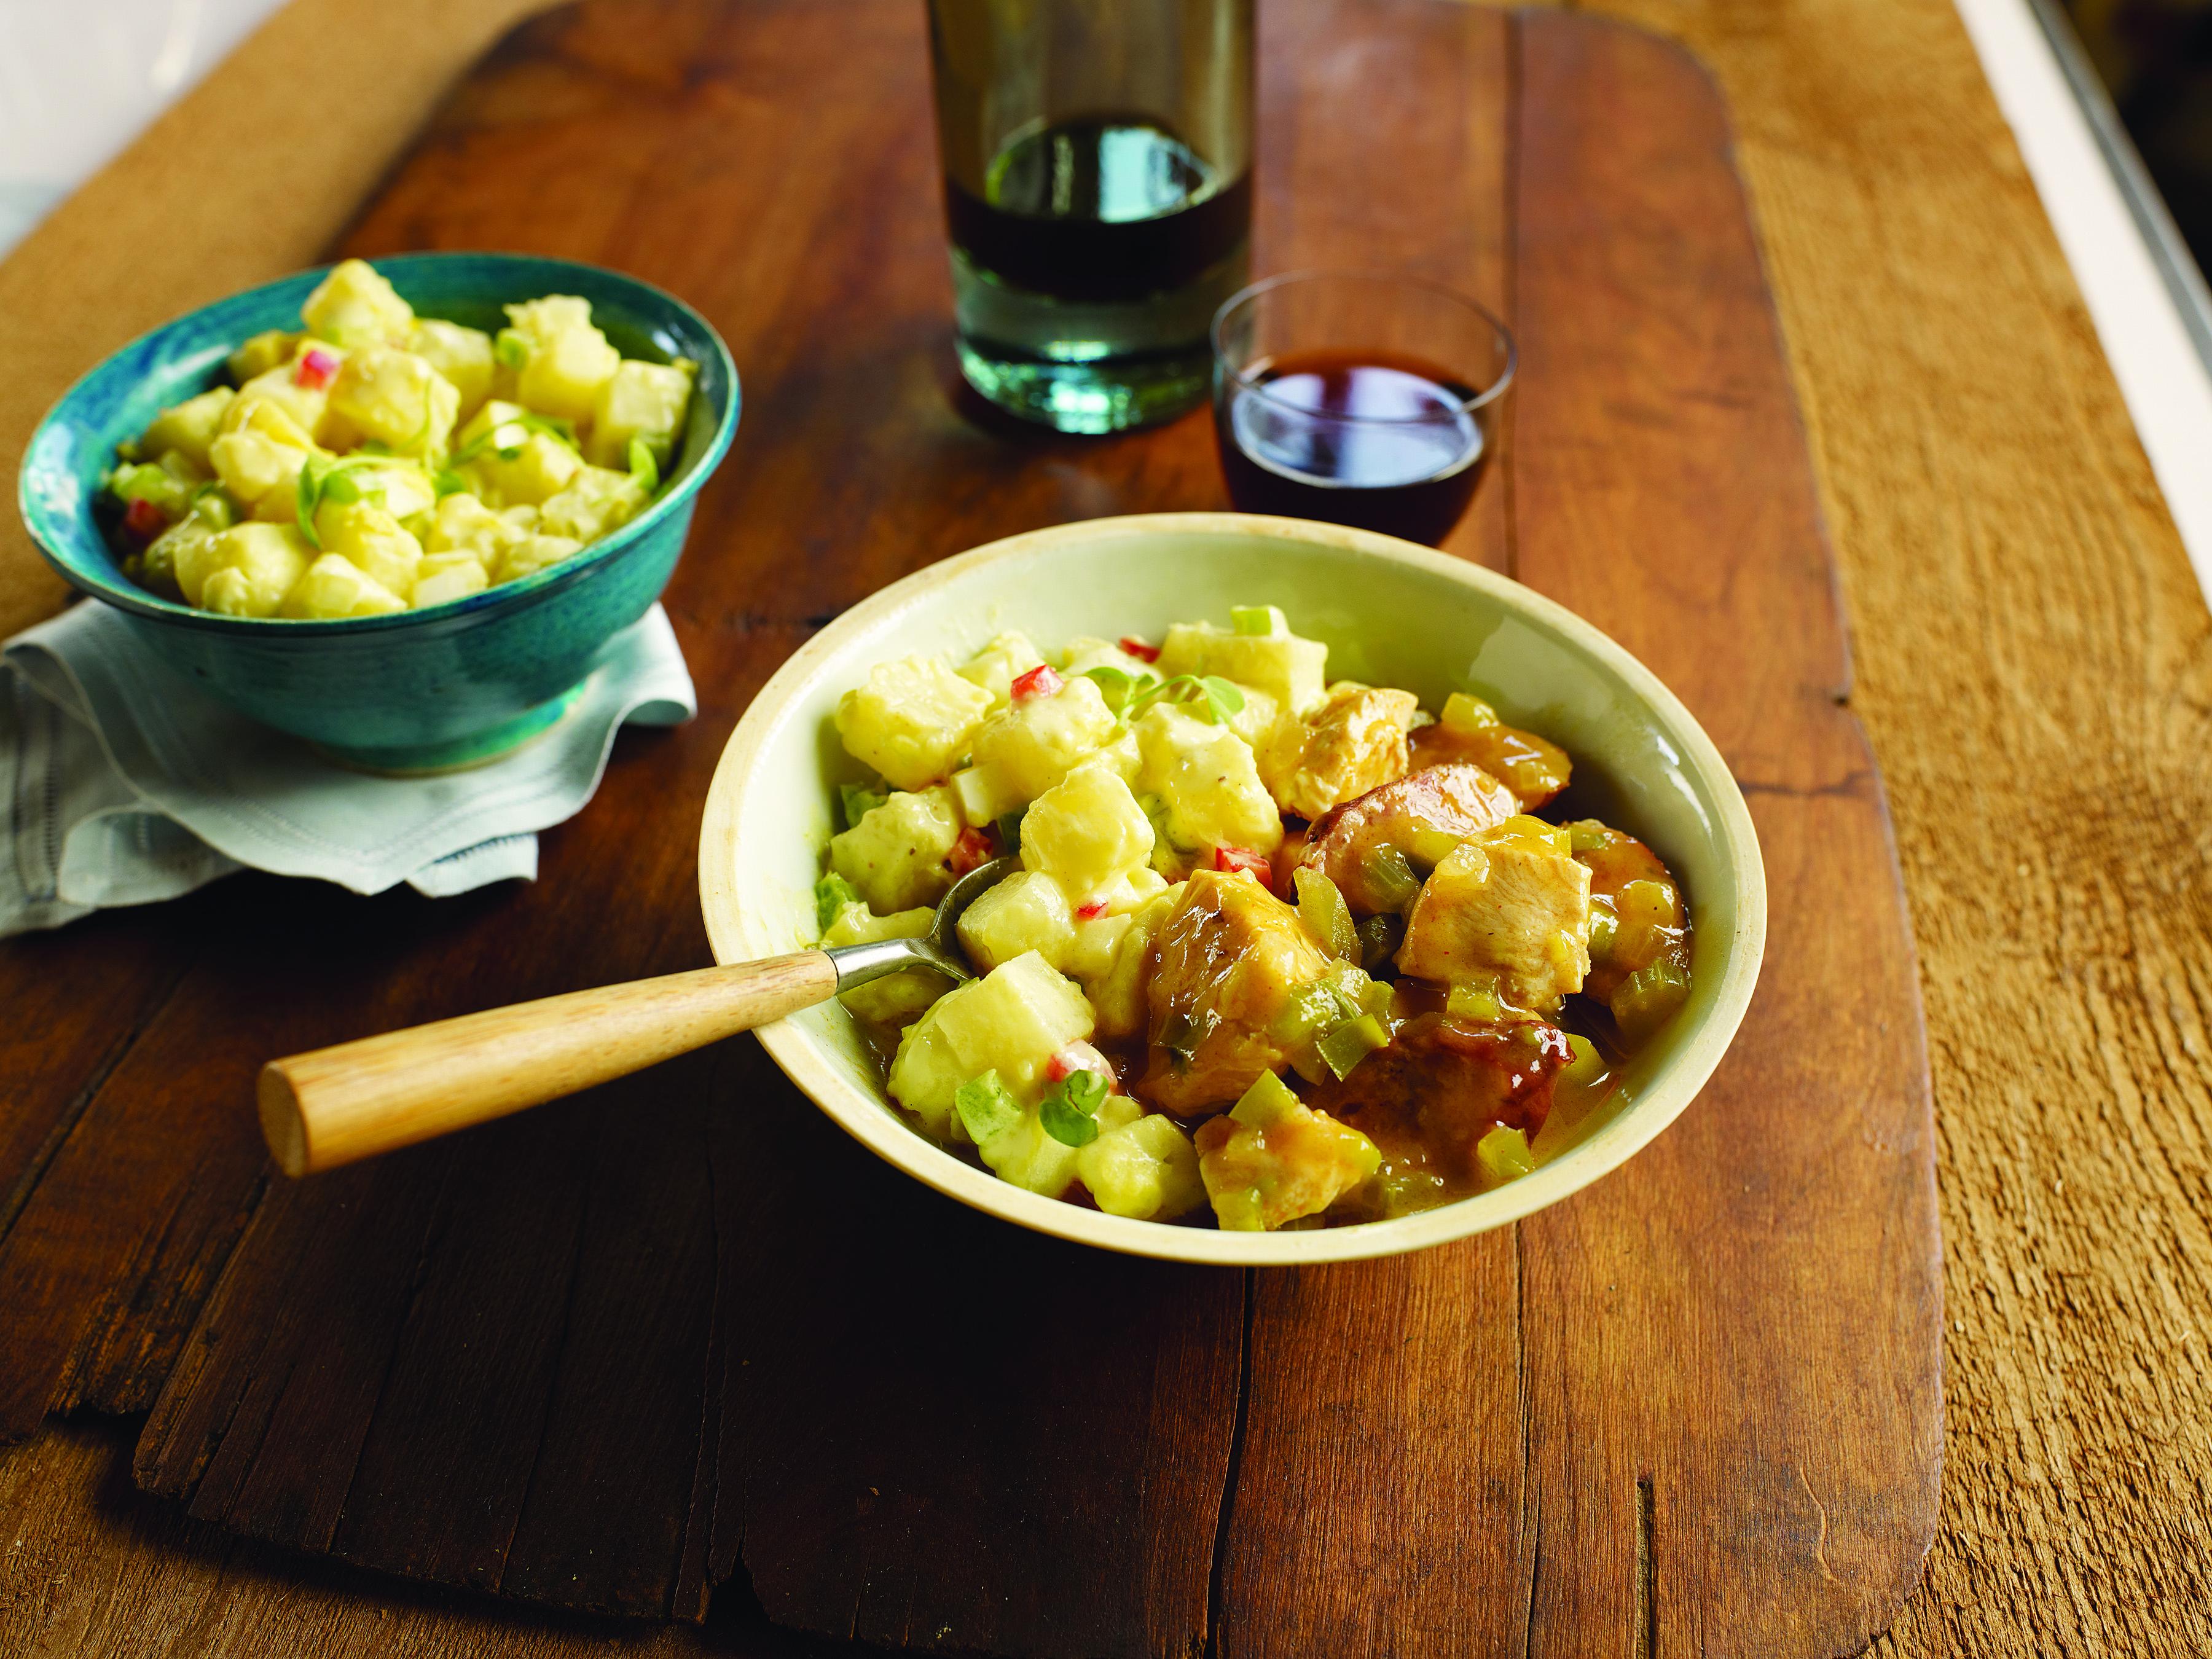 Potato Salad Recipe For Gumbo